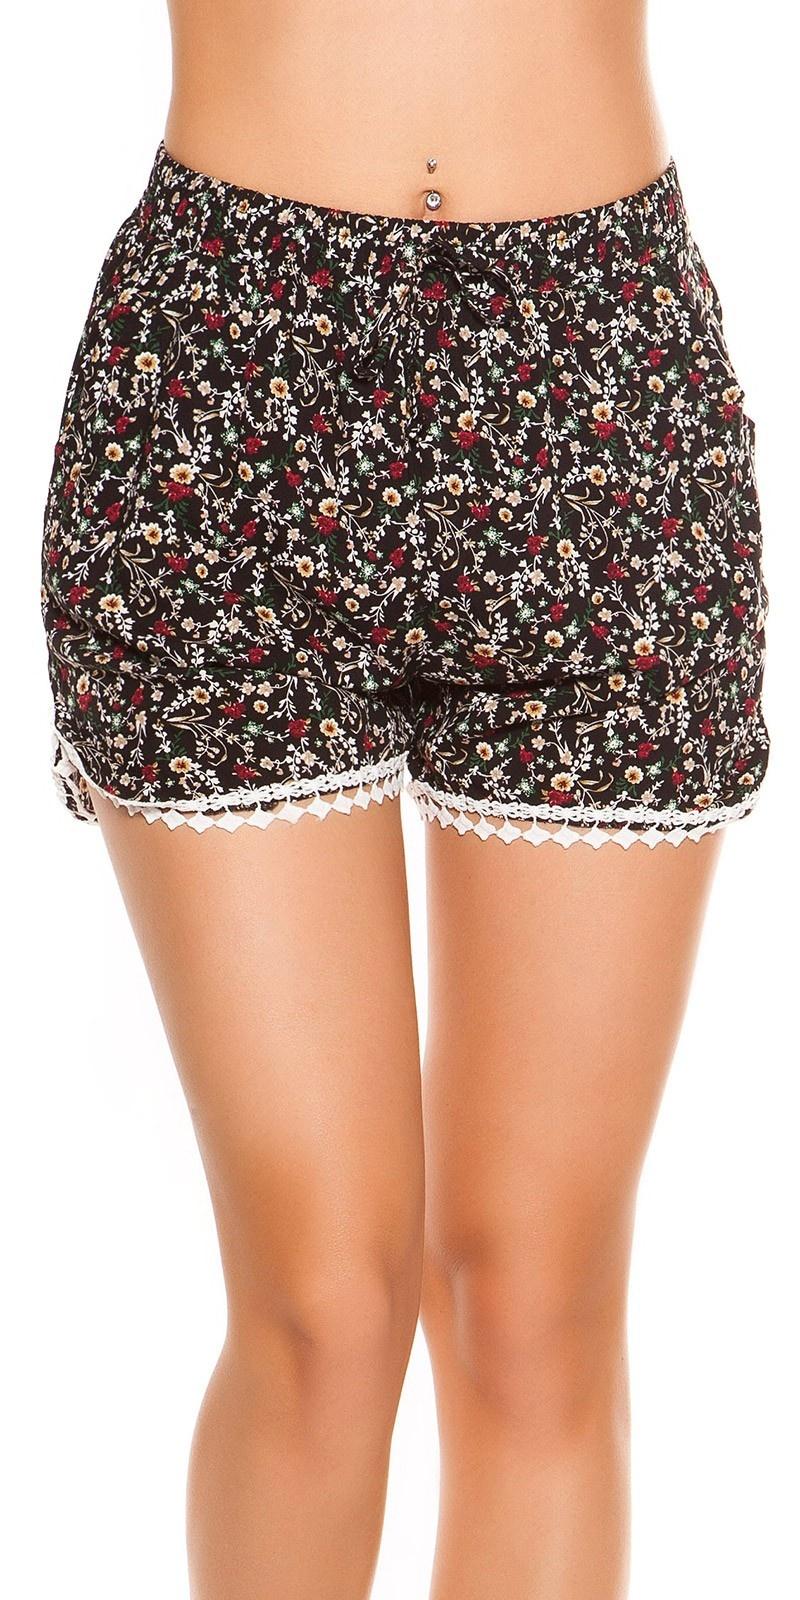 Sexy shorts in bloemen-print zwart